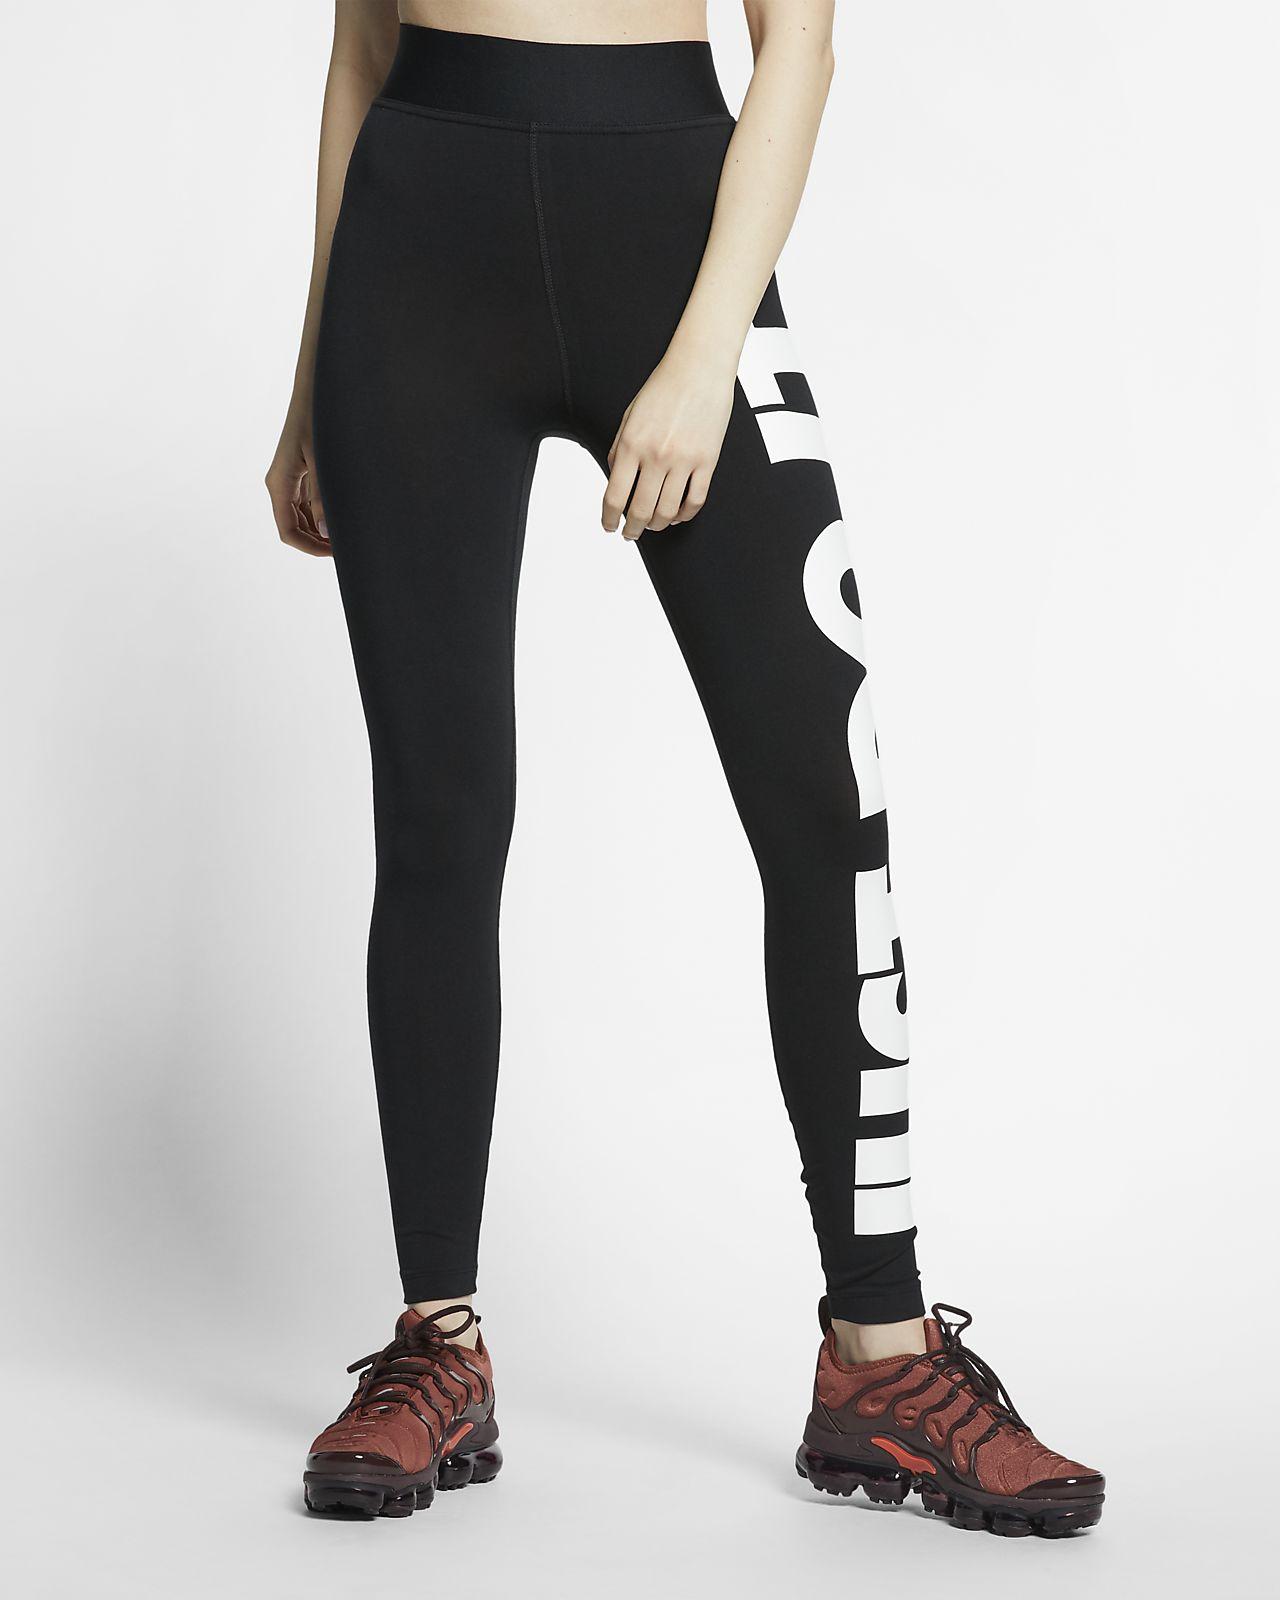 b47c1f09439959 Nike Sportswear Leg-A-See JDI Women's High-Rise Leggings. Nike.com ID